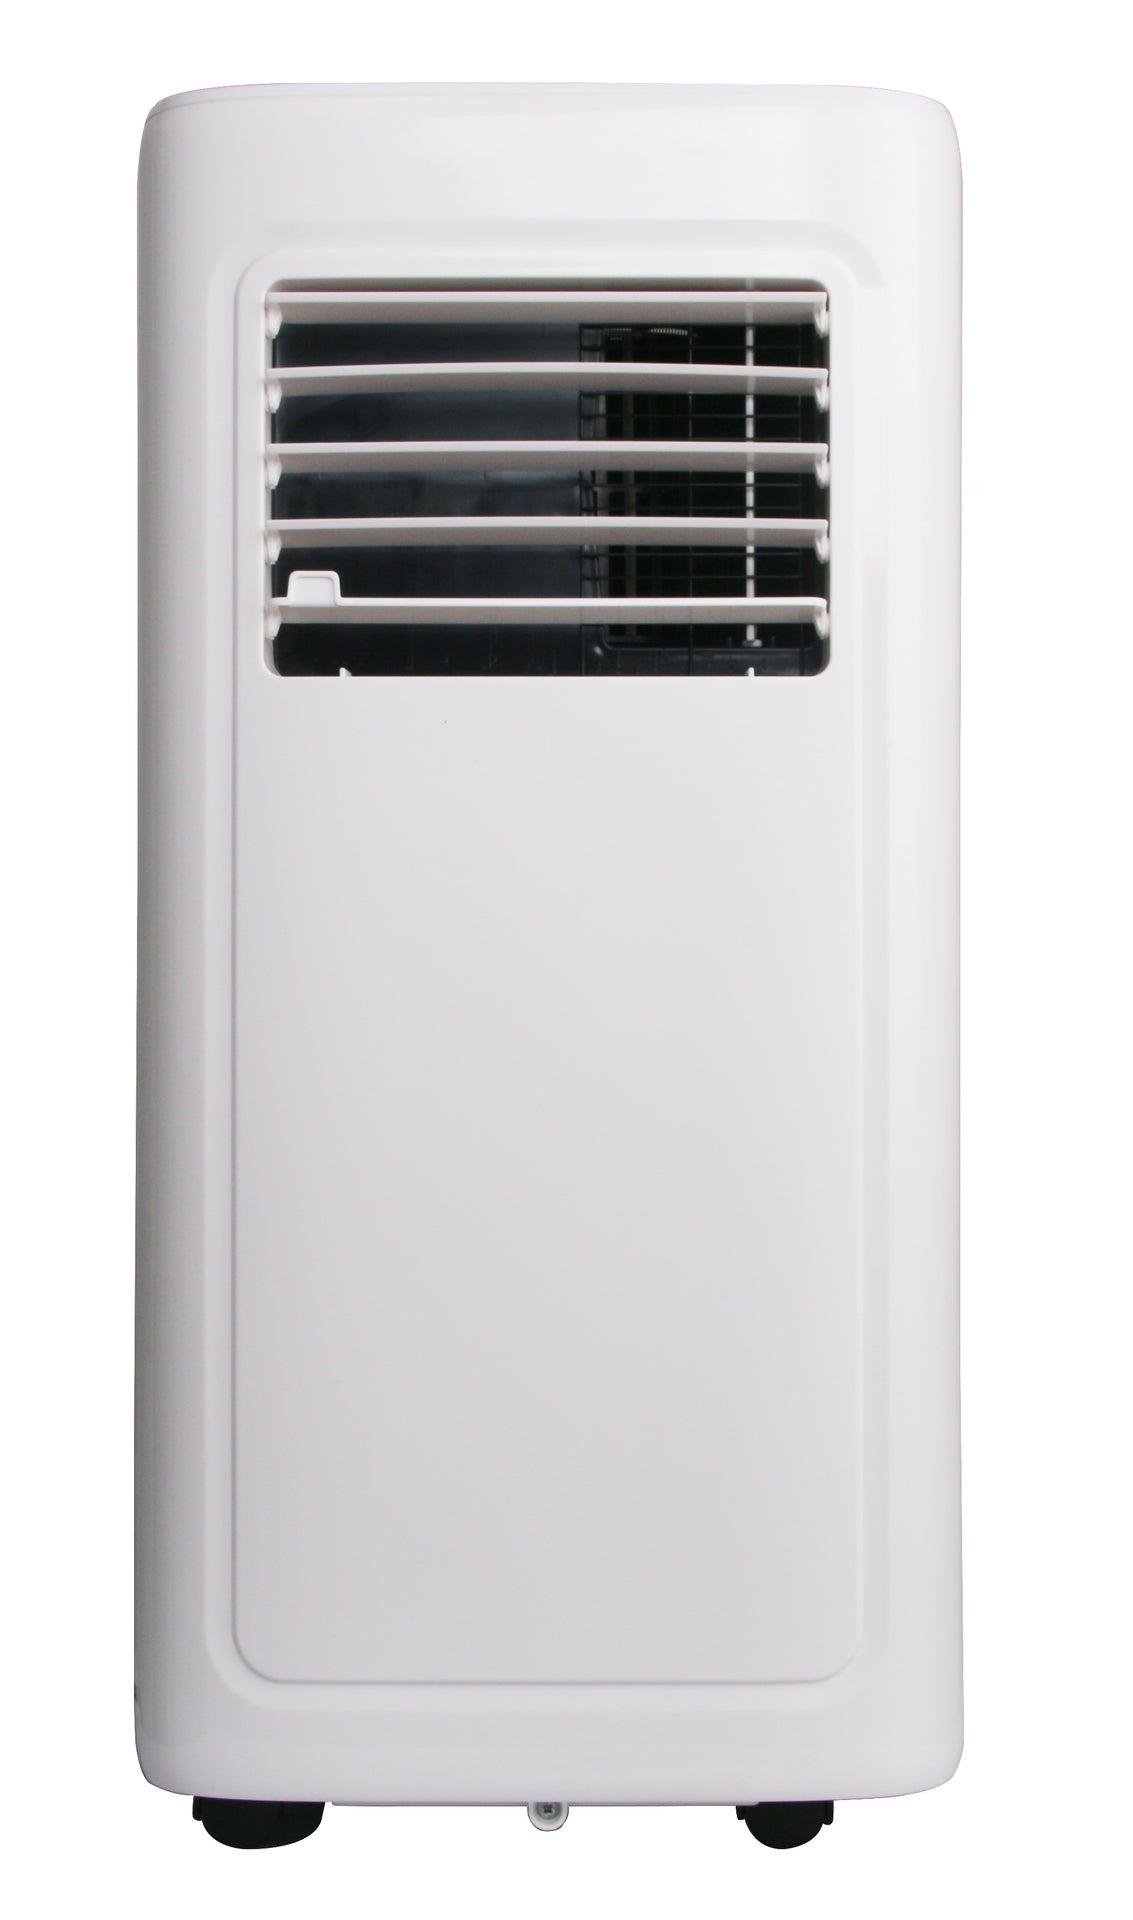 Climatiseur Monobloc Reversible Optimeo 2750 W Leroy Merlin